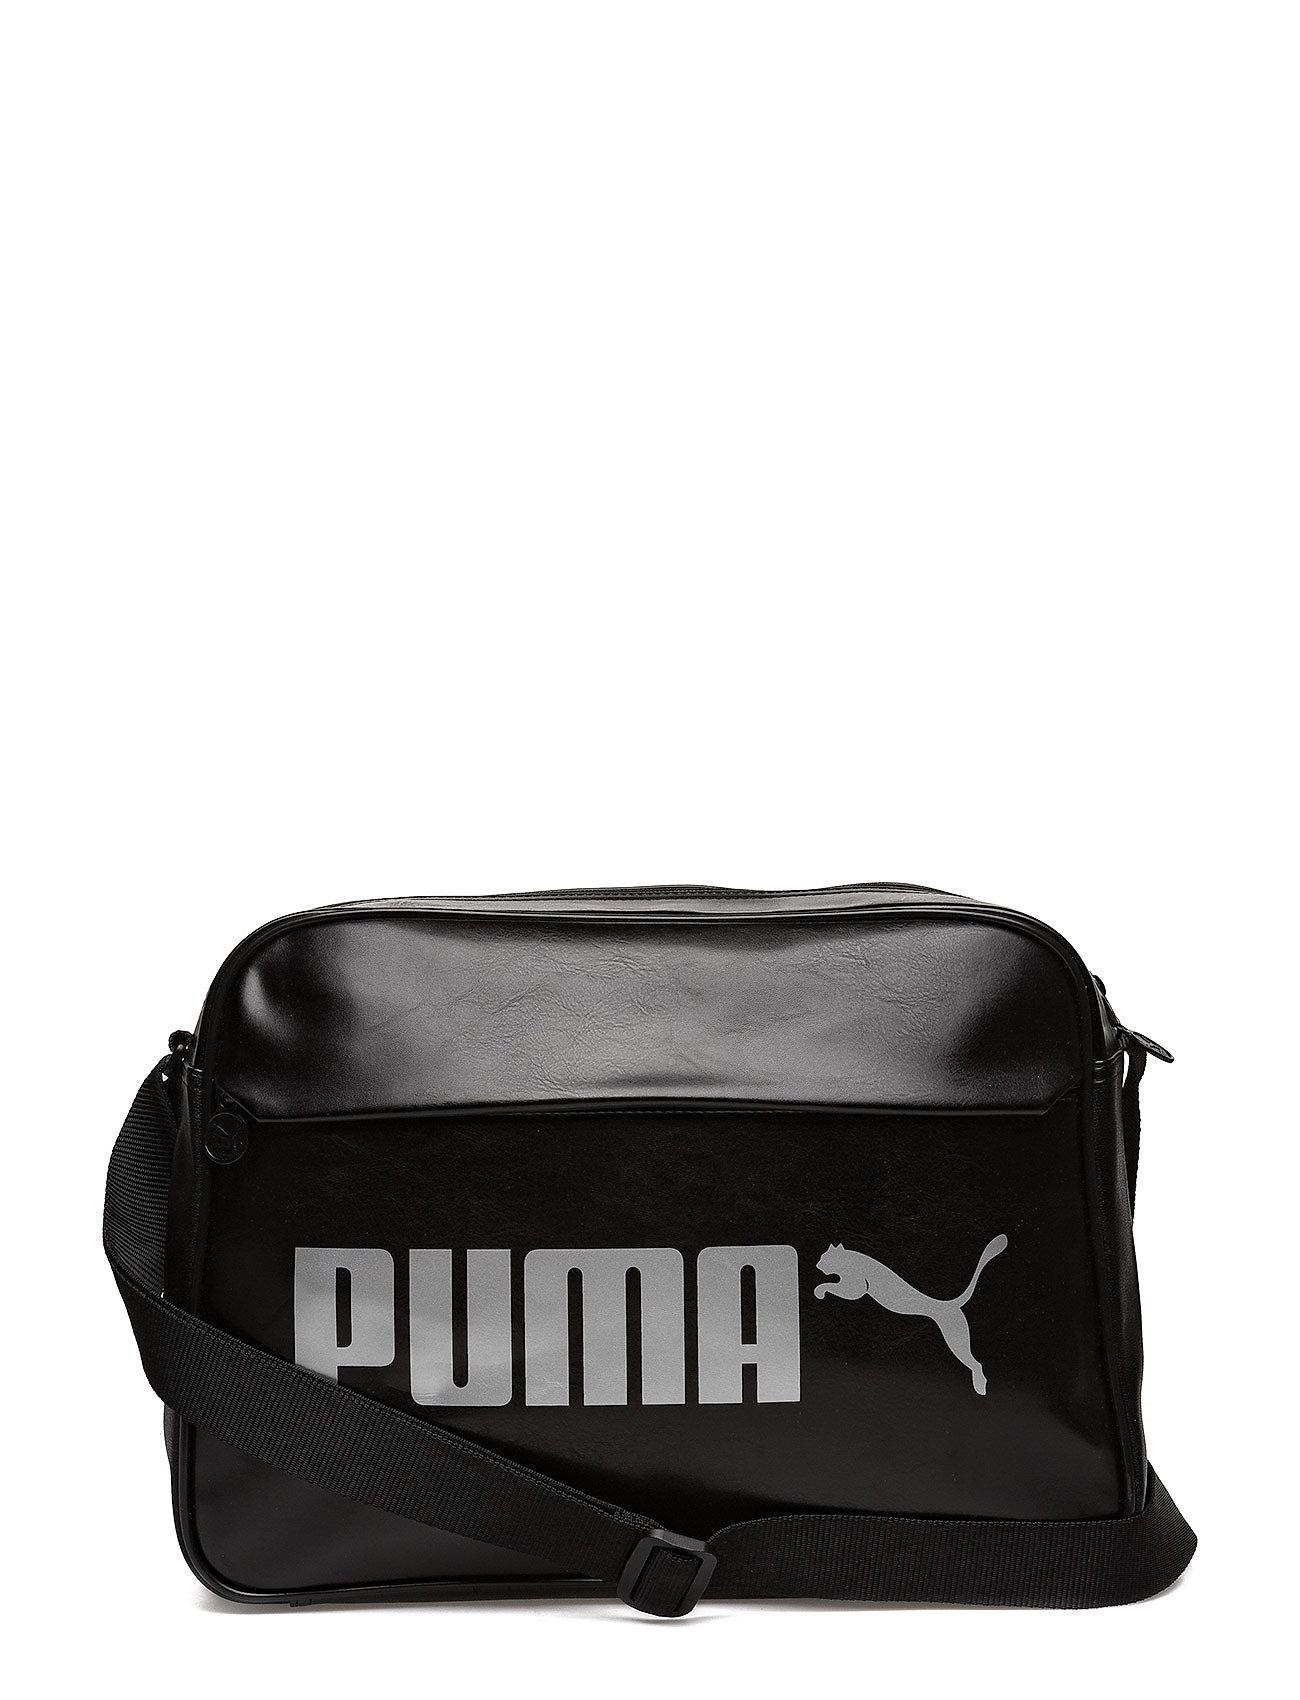 Laukut Puma : Campus reporter pu puma black  boozt